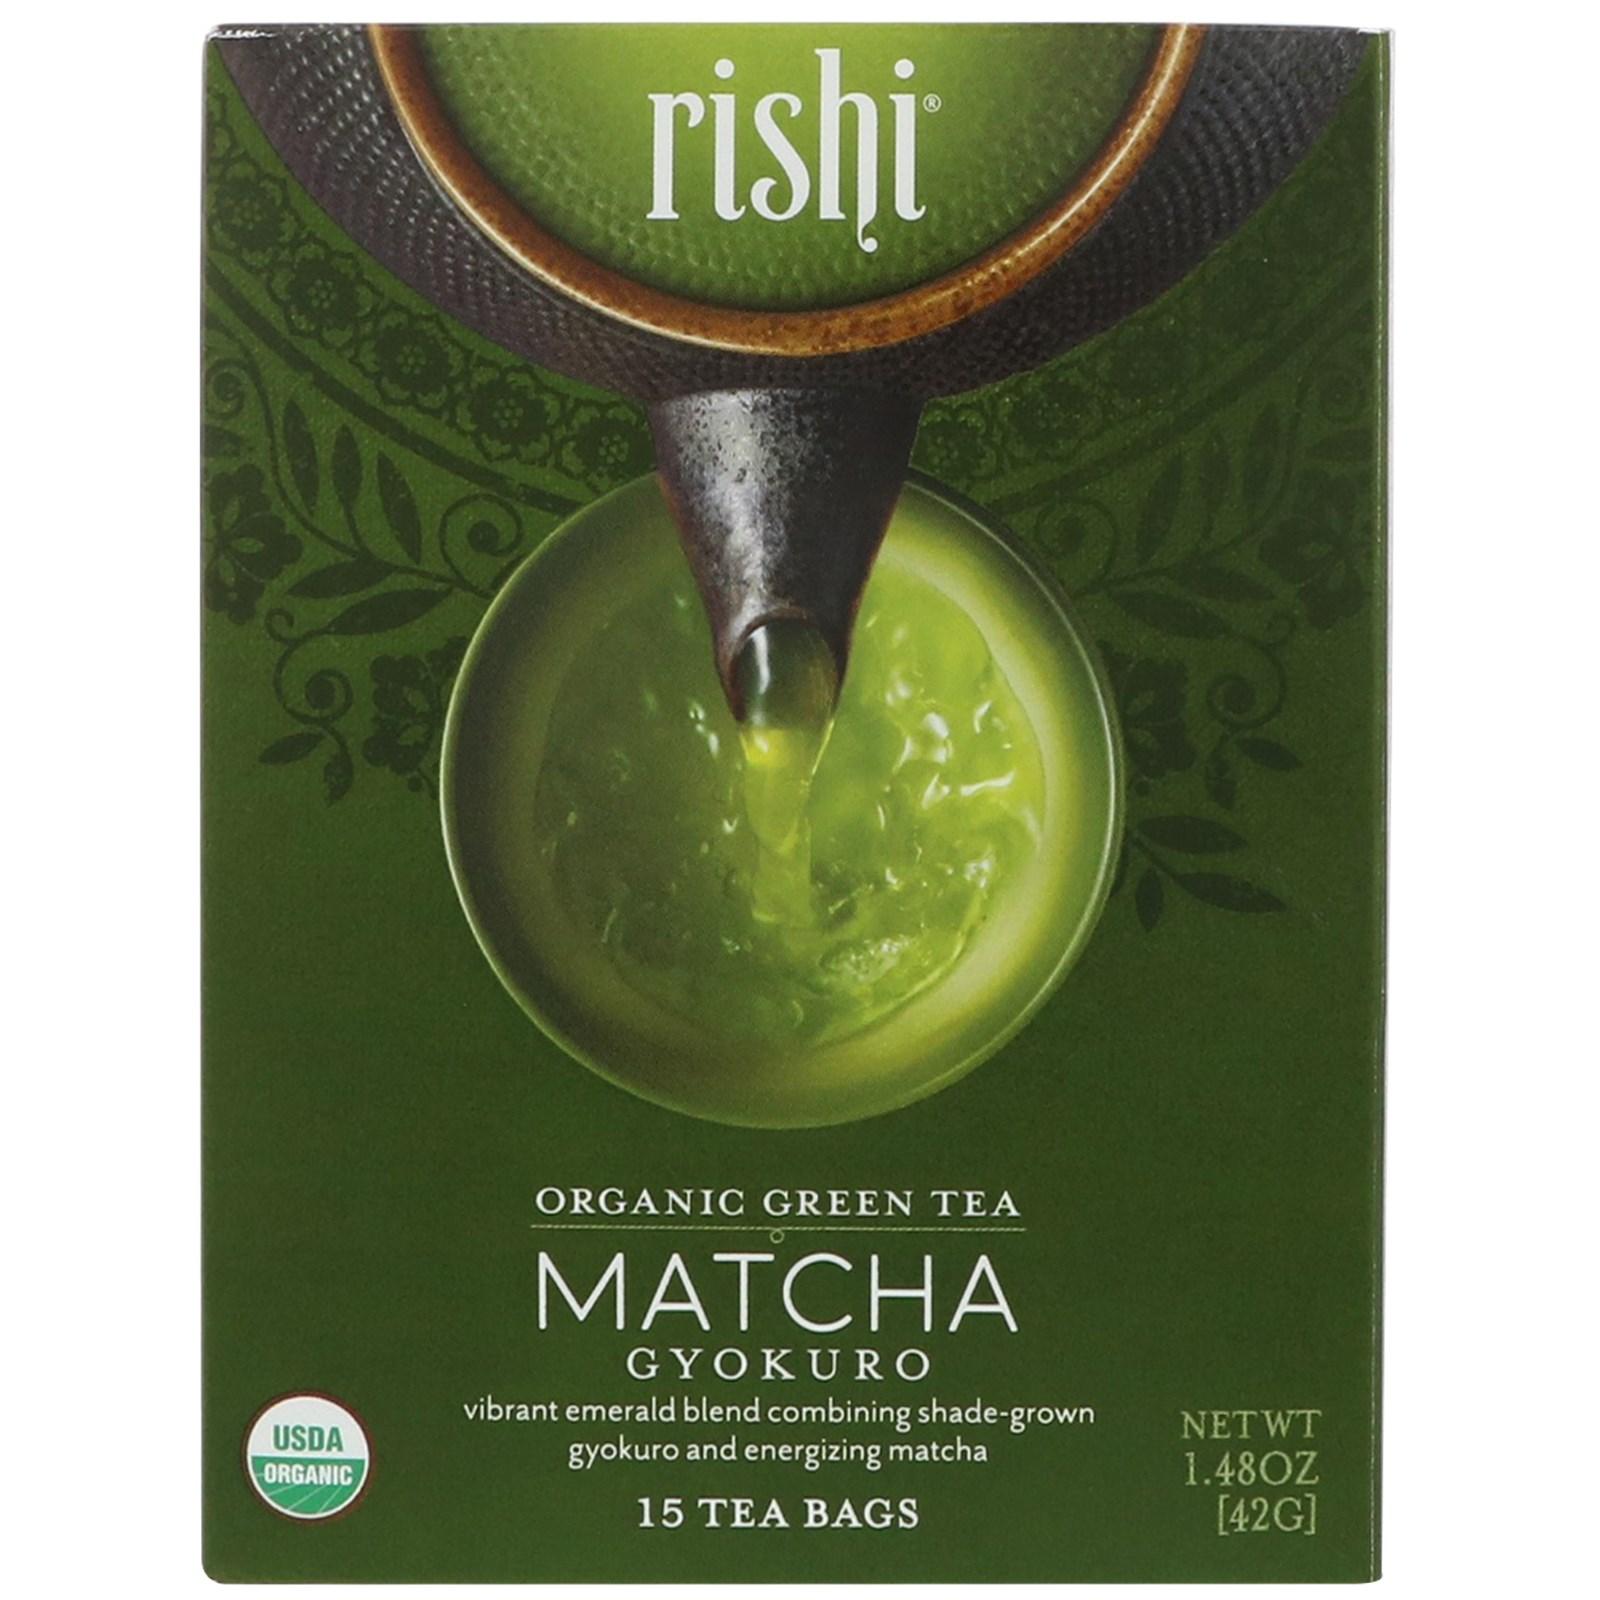 Rishi Tea, Organic Green Tea, Matcha Gyokuro, 15 Tea Bags